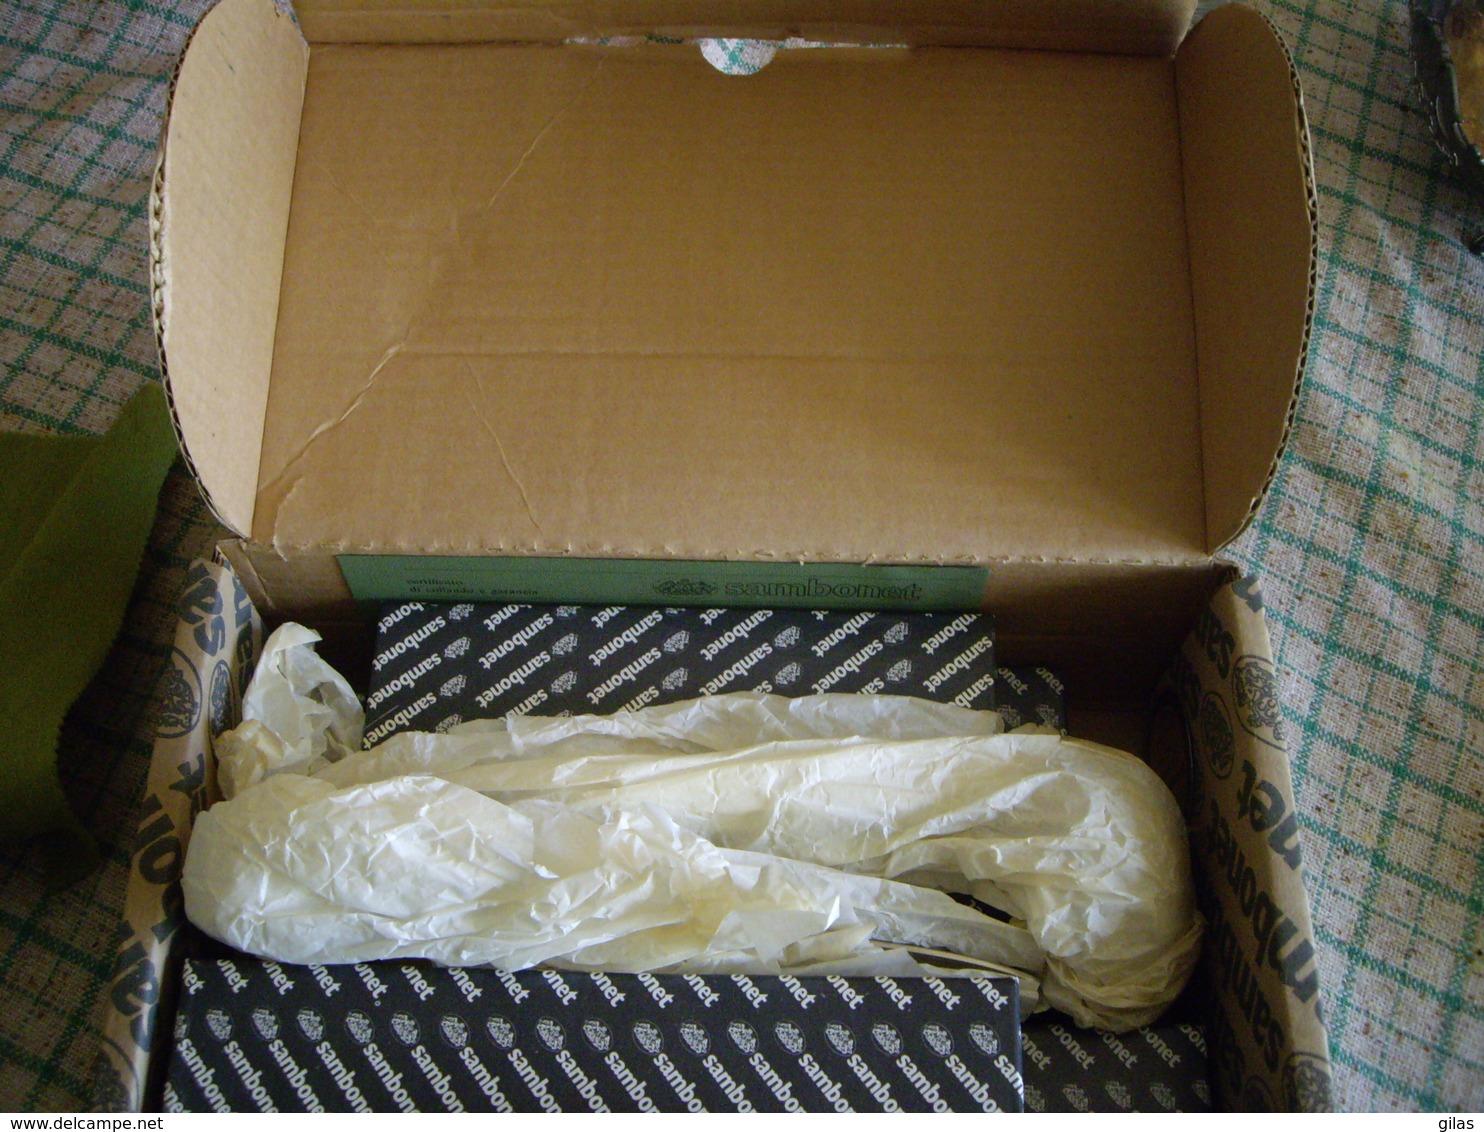 Sambonet Servizio Posate 75 Pezzi Monoblocco Inox 18/10 - Forks